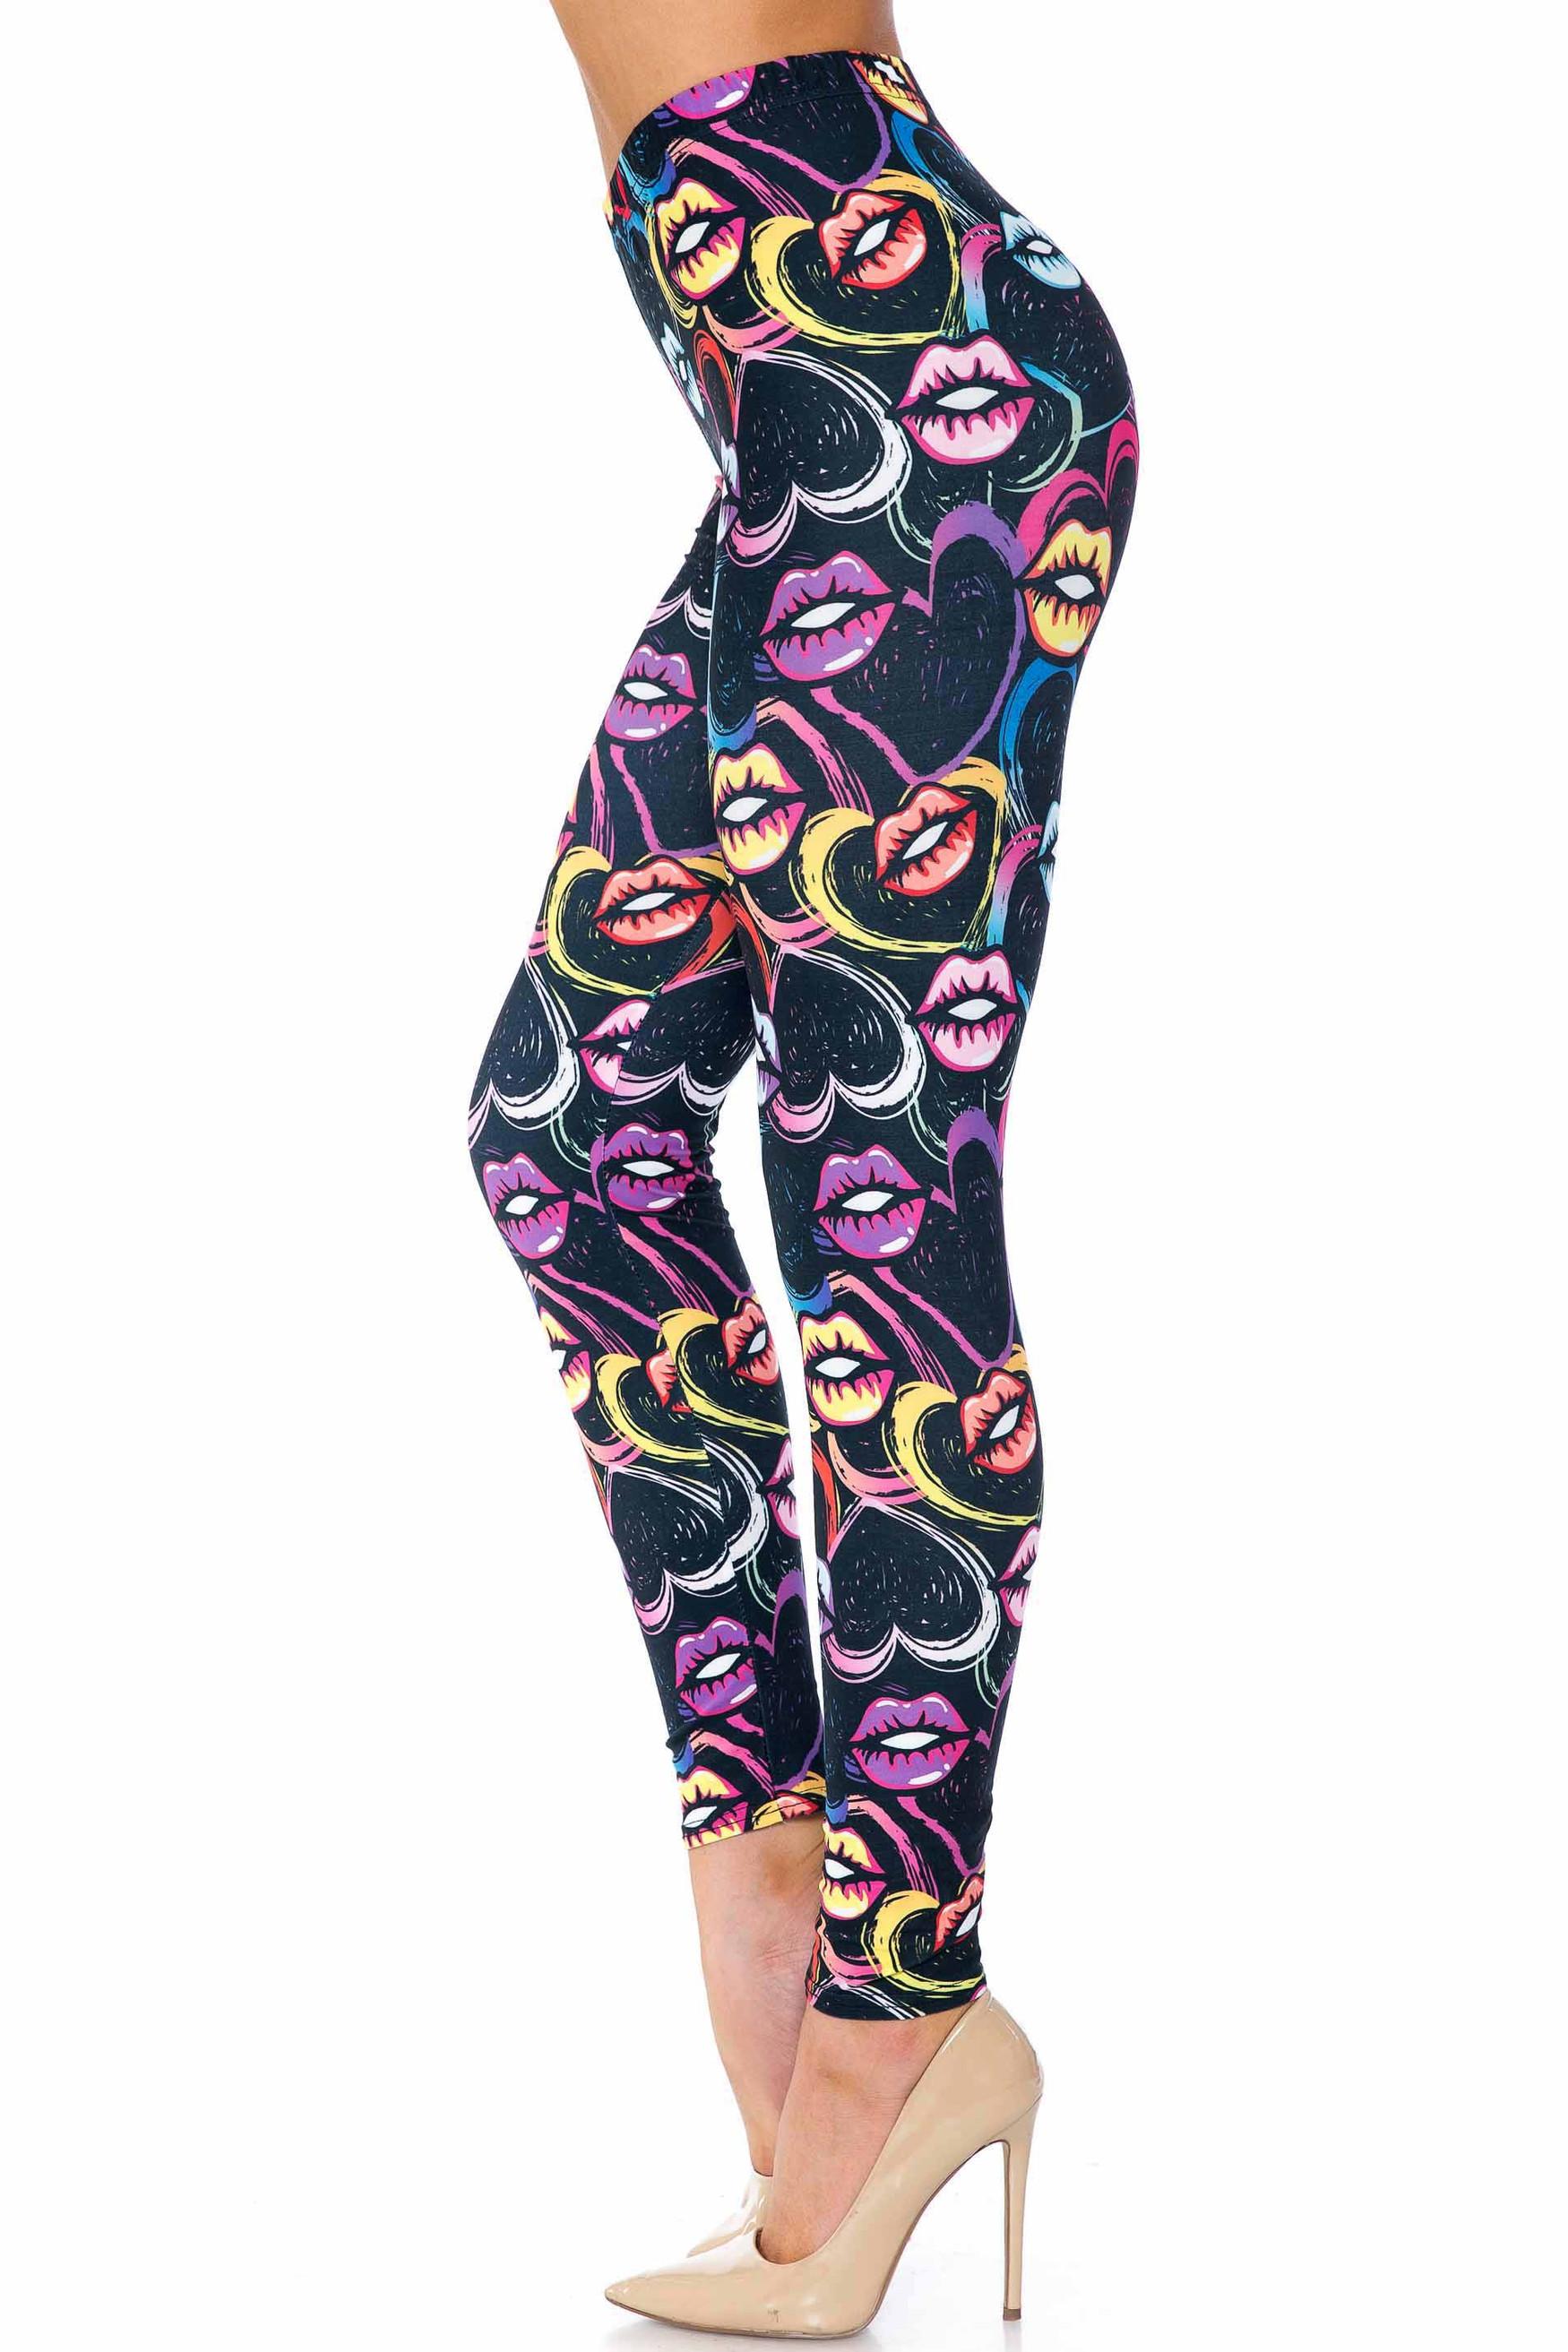 Colorful Lips and Hearts Kids Leggings - USA Fashion™